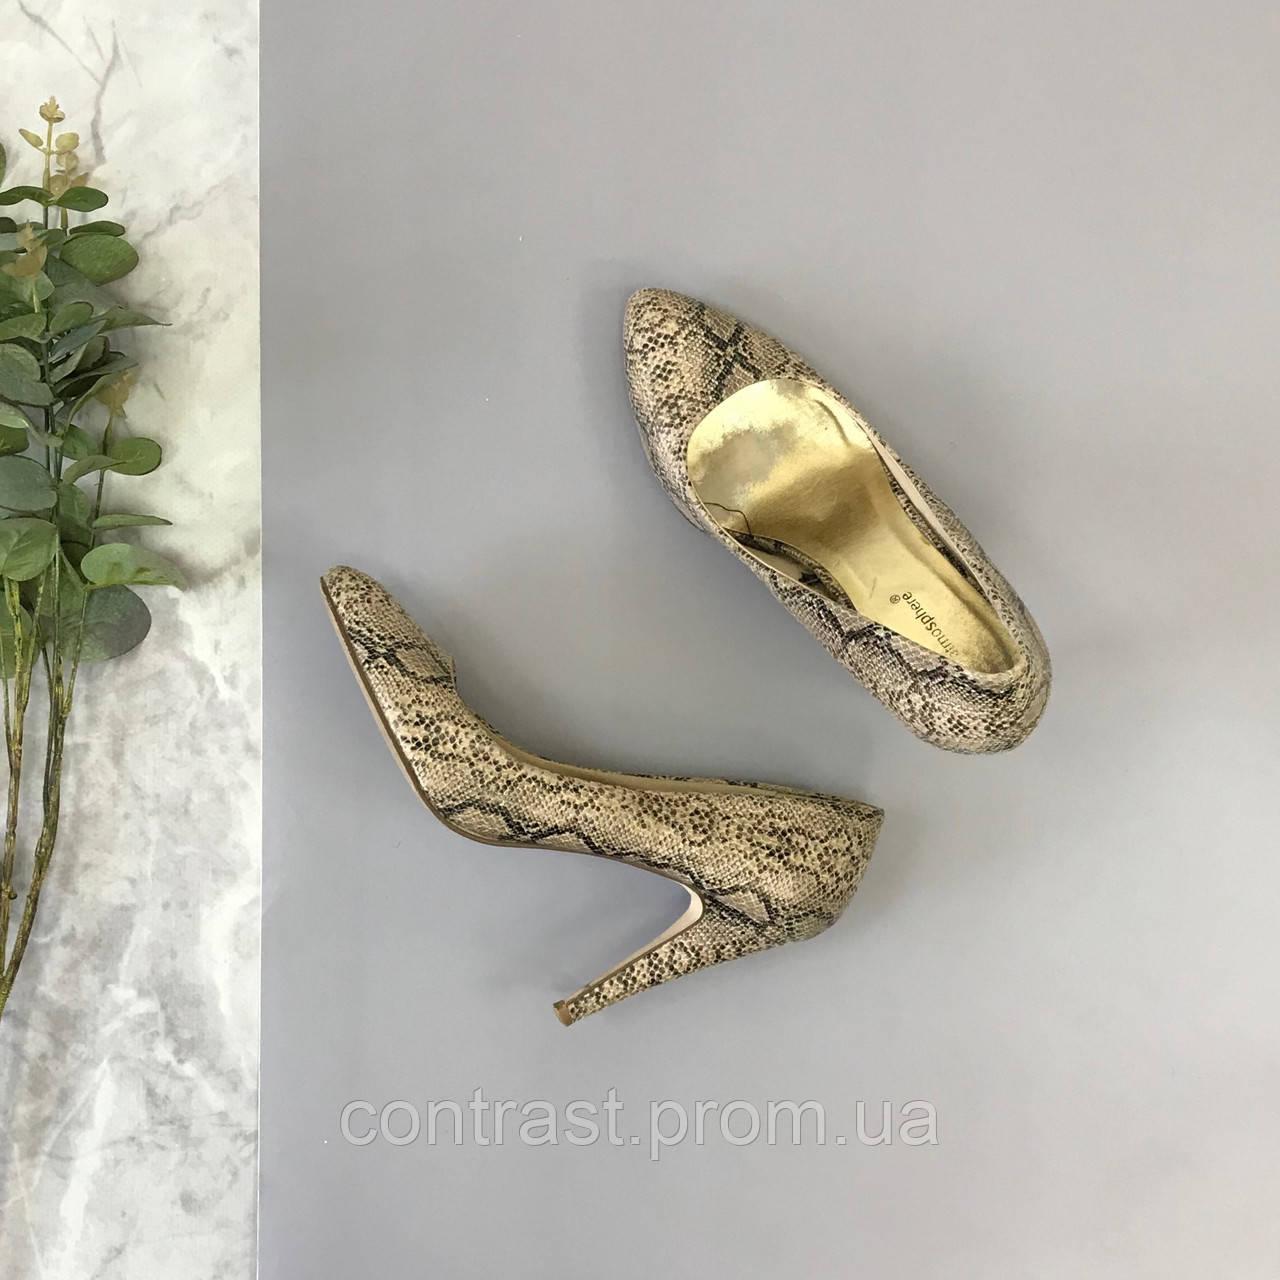 Туфли-лодочки со змеиным принтом  SH1845198